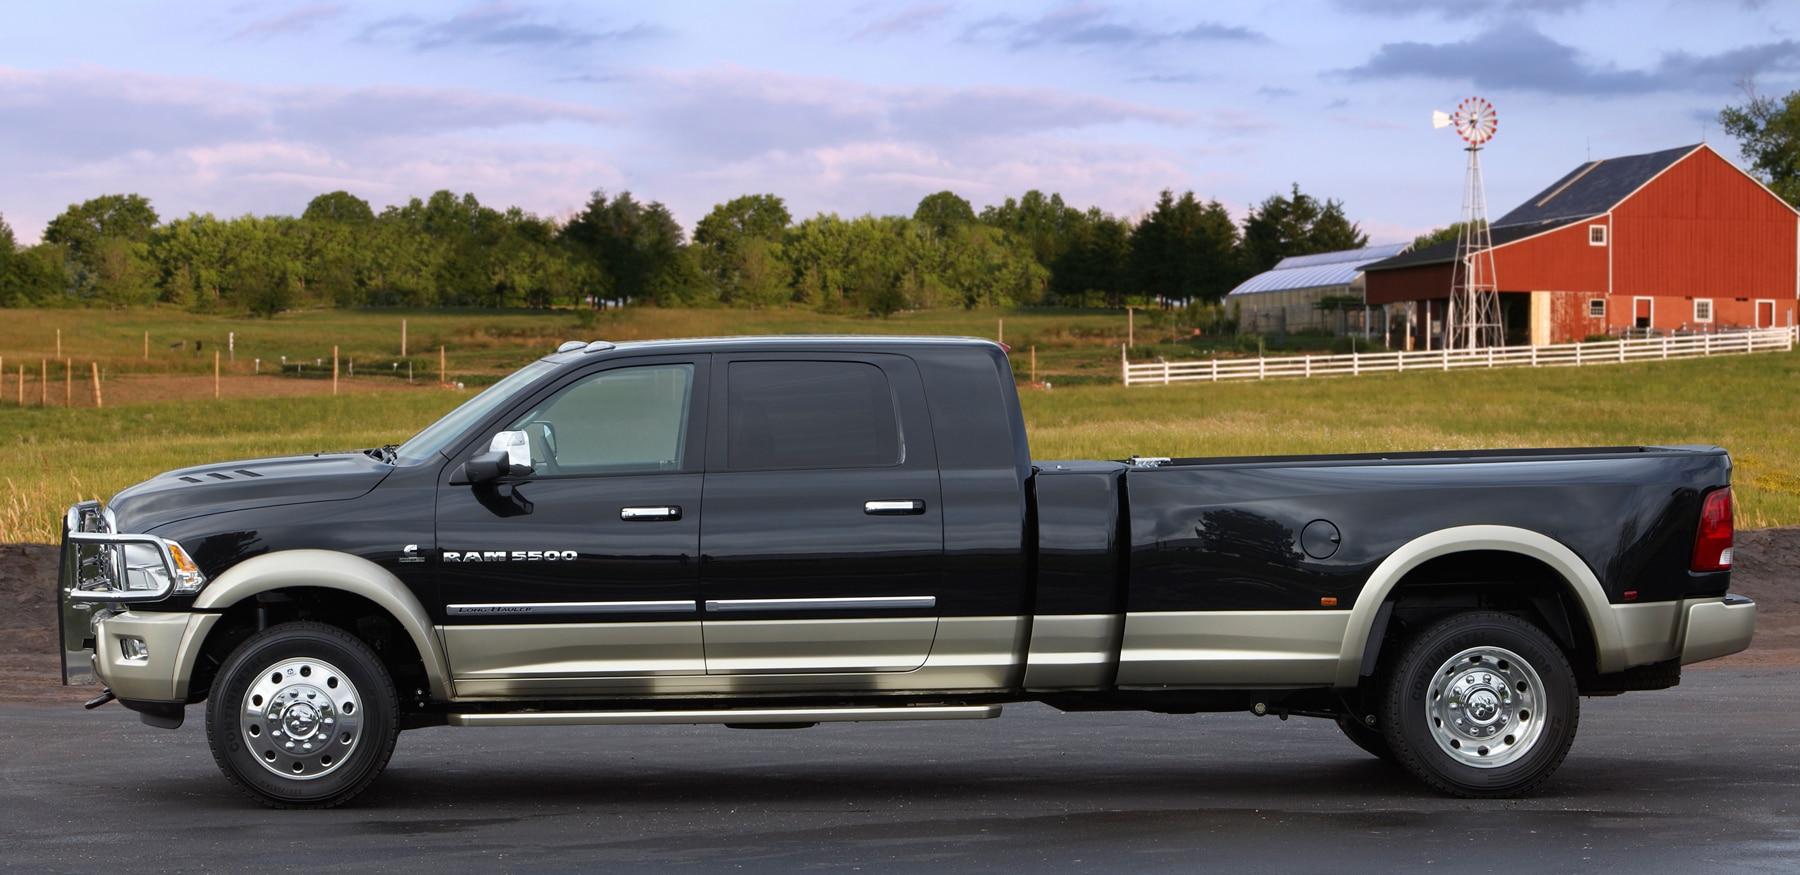 Mega Cab Long Bed >> Beyond Big: Ram Concept Adds Long Bed to Mega Cab